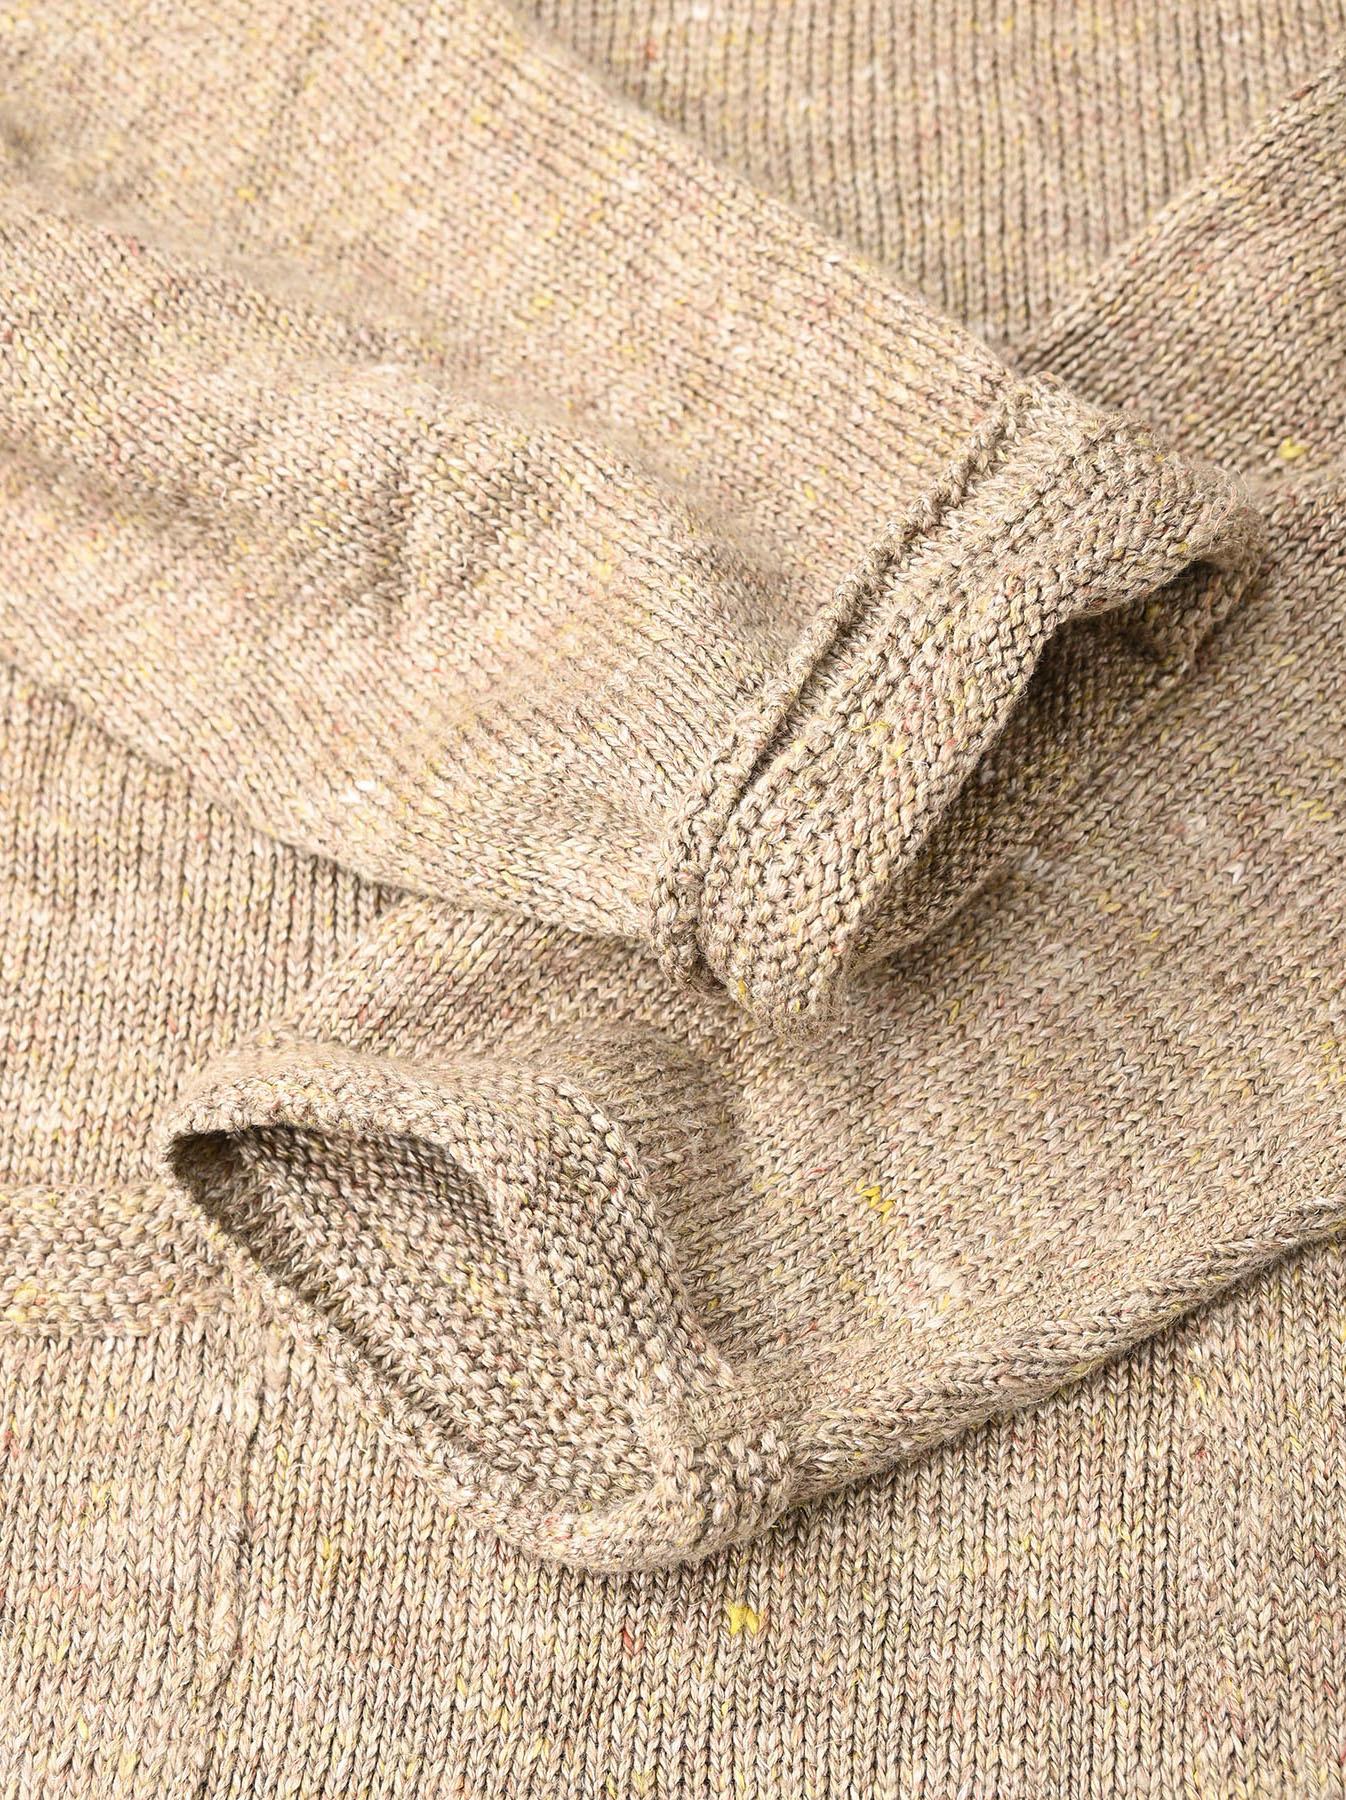 WH Linen Tweed Knit-sew 908 Umahiko Sweater (0321)-12